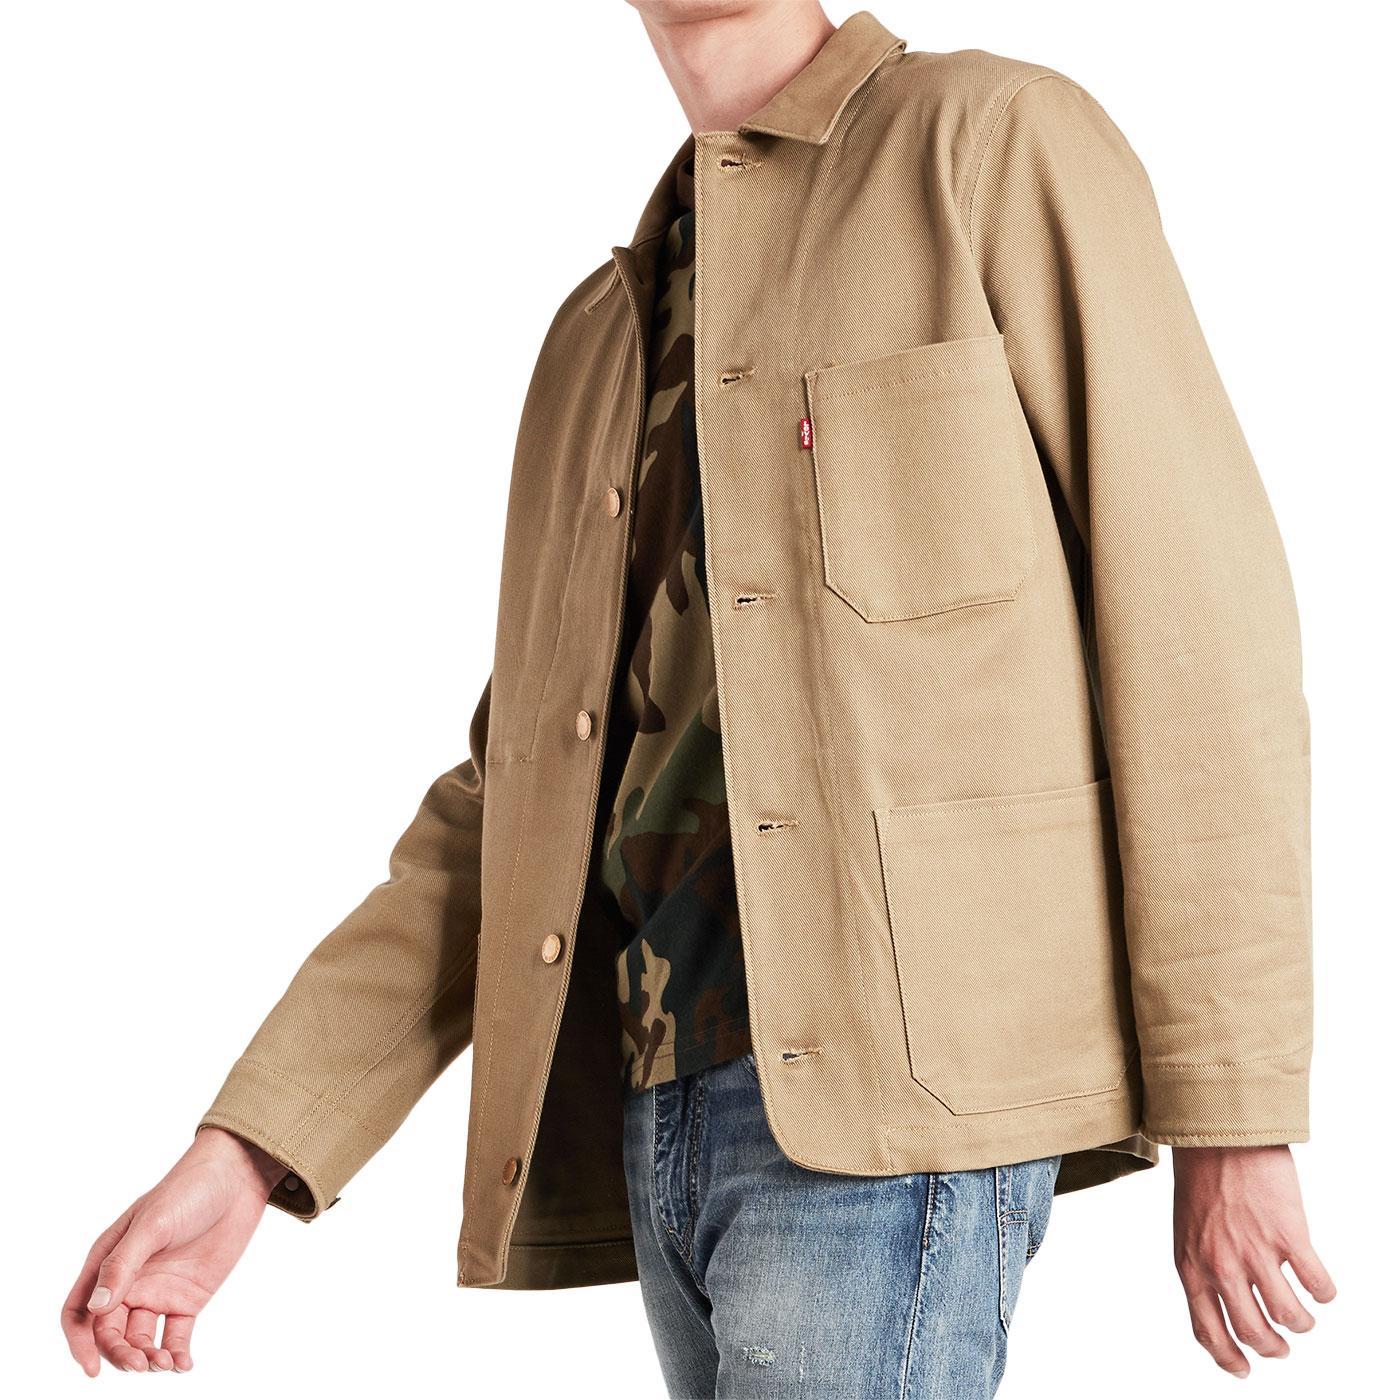 LEVI'S Men's Retro Archive Engineers Coat 2.0 (HG)